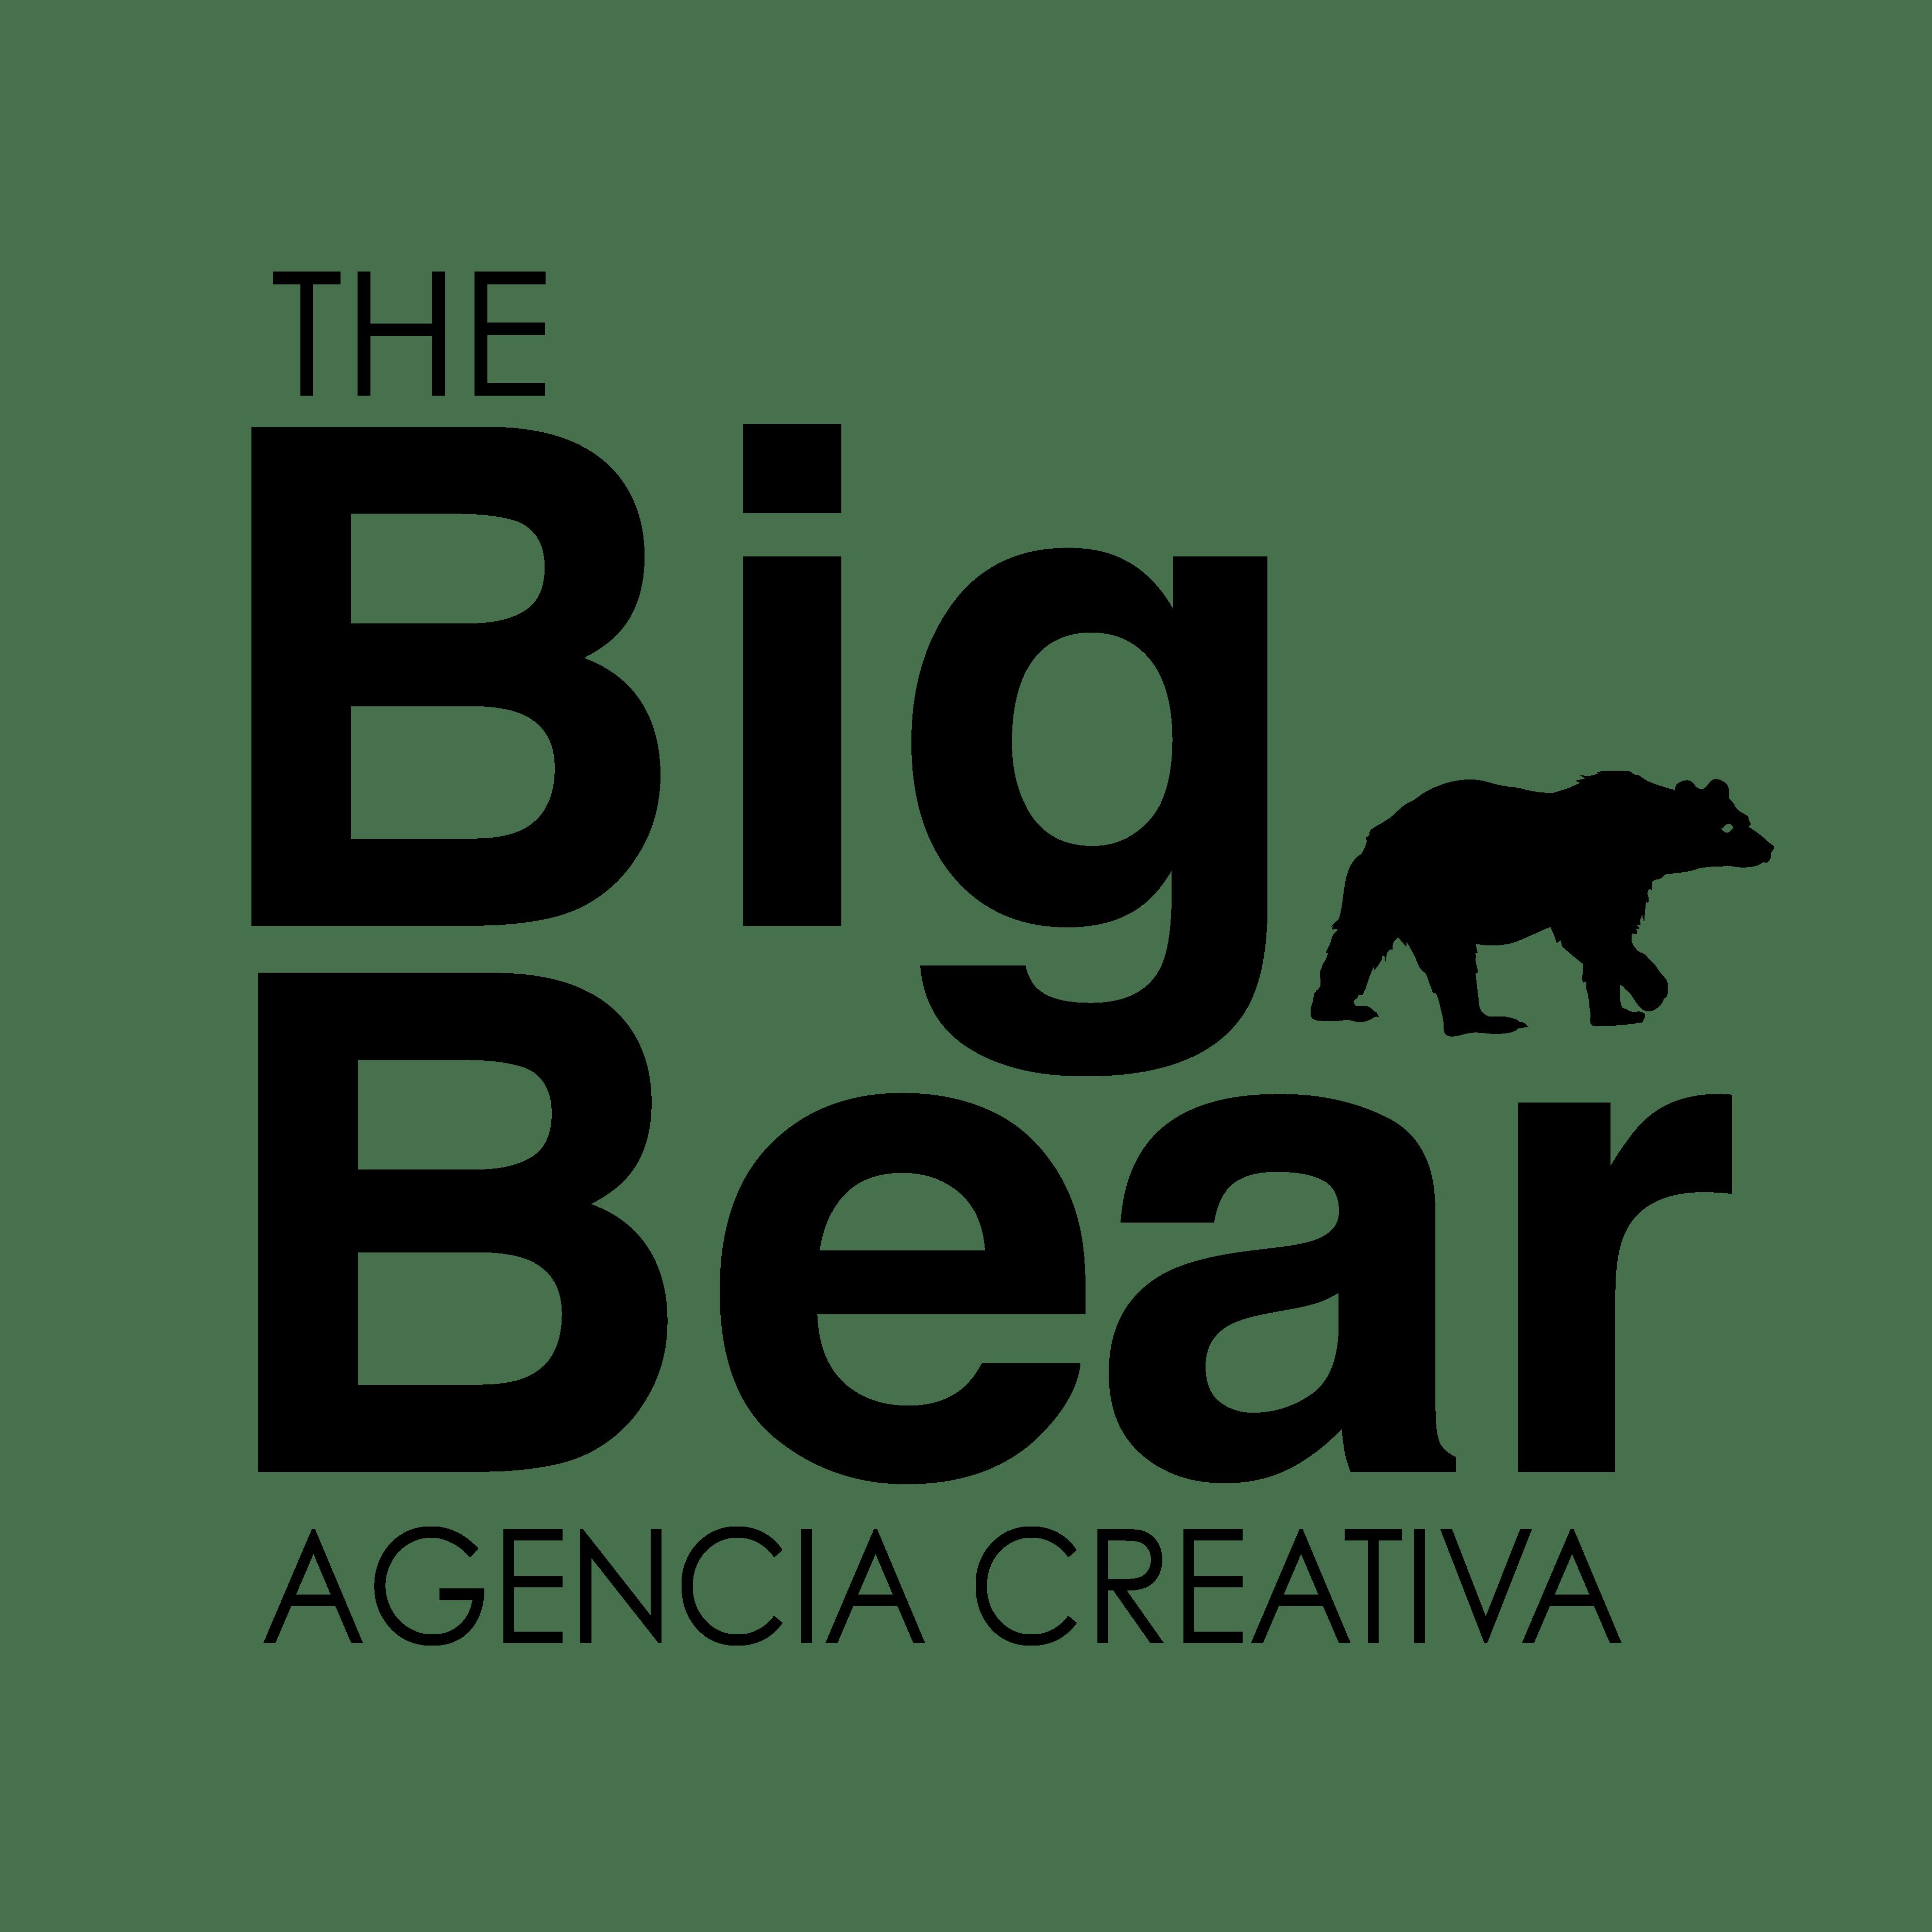 The Big Bear S.A.S